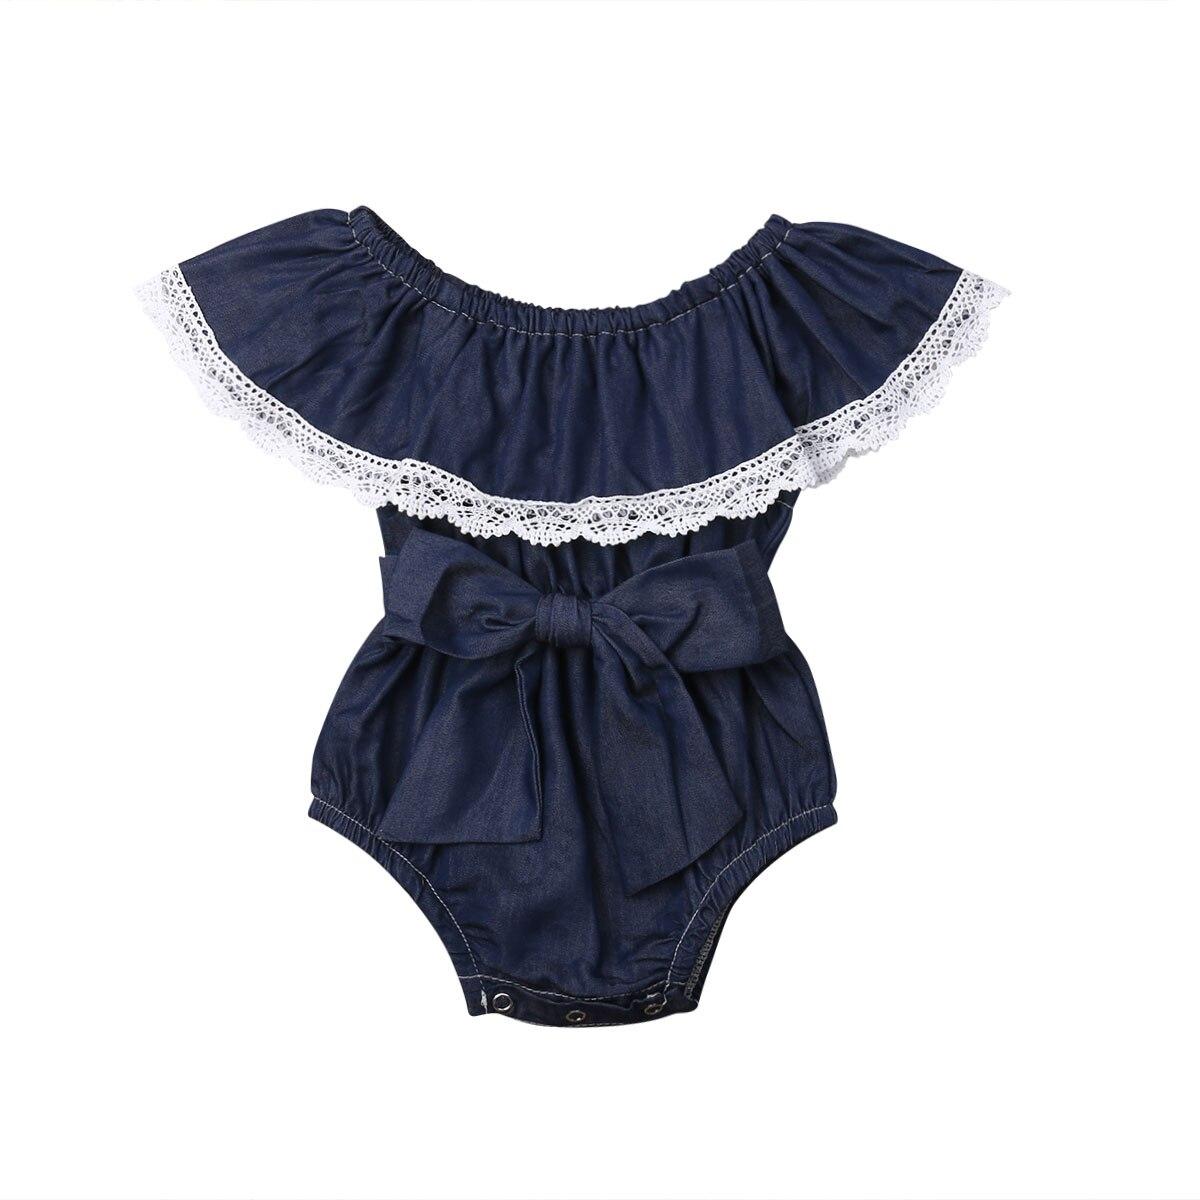 0-24 Mt Mode Neugeborenen Baby Mädchen Off Schulter Spitze Kap Kragen Bogen Denim Romper Overall Outfits Sunsuit Kleidung